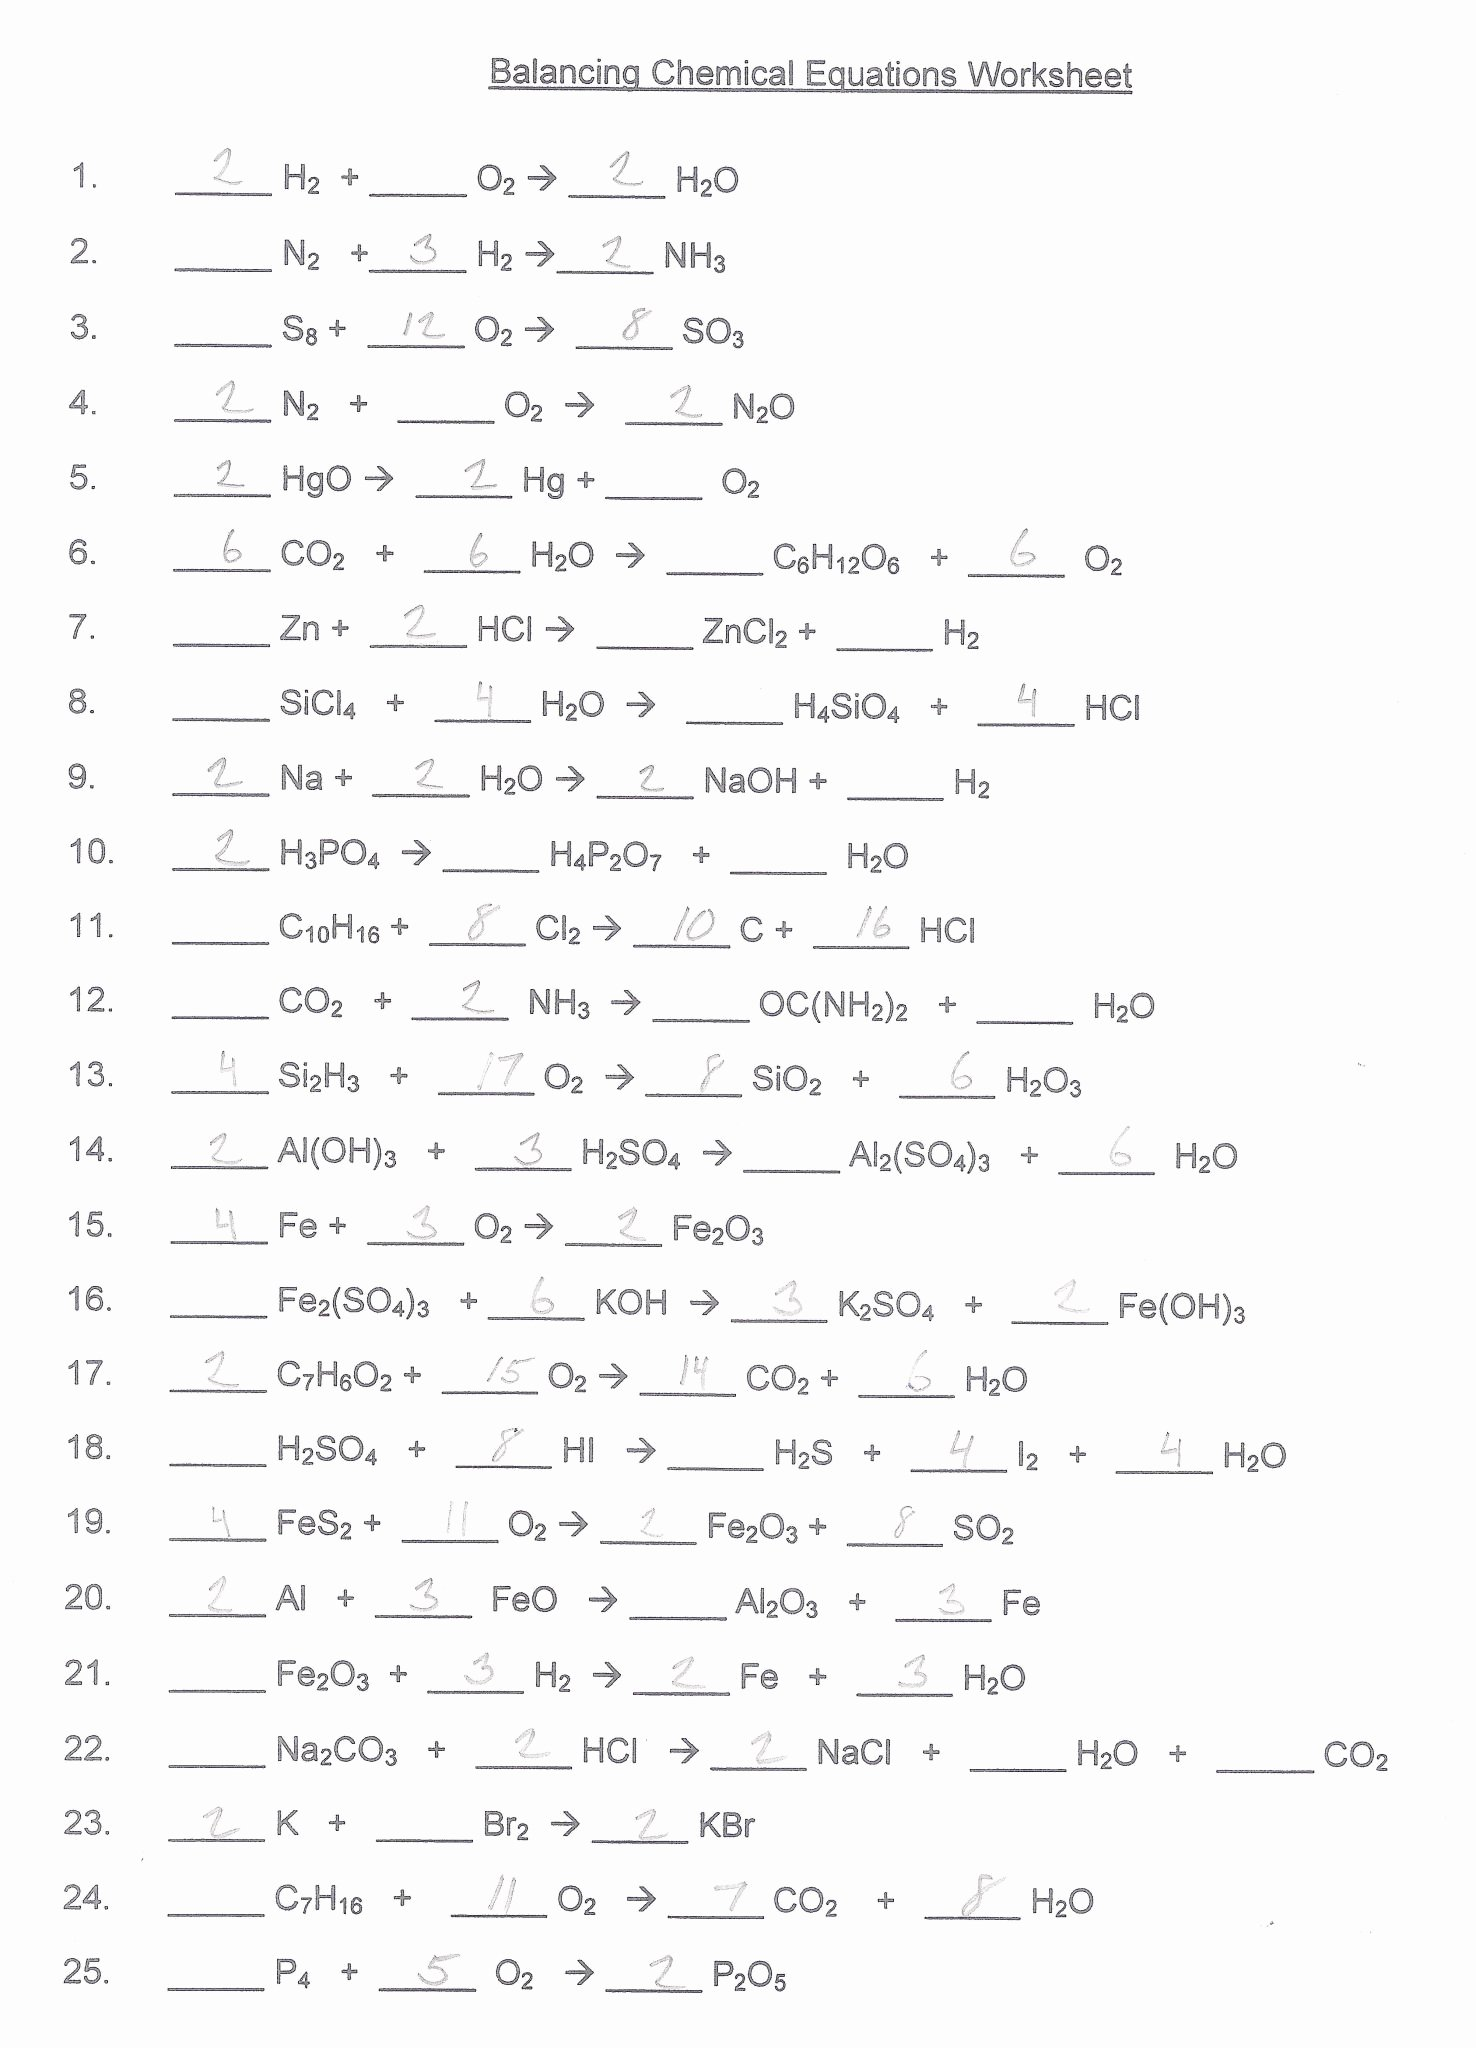 Calculating Specific Heat Worksheet Inspirational Calculating Specific Heat Worksheet Answers